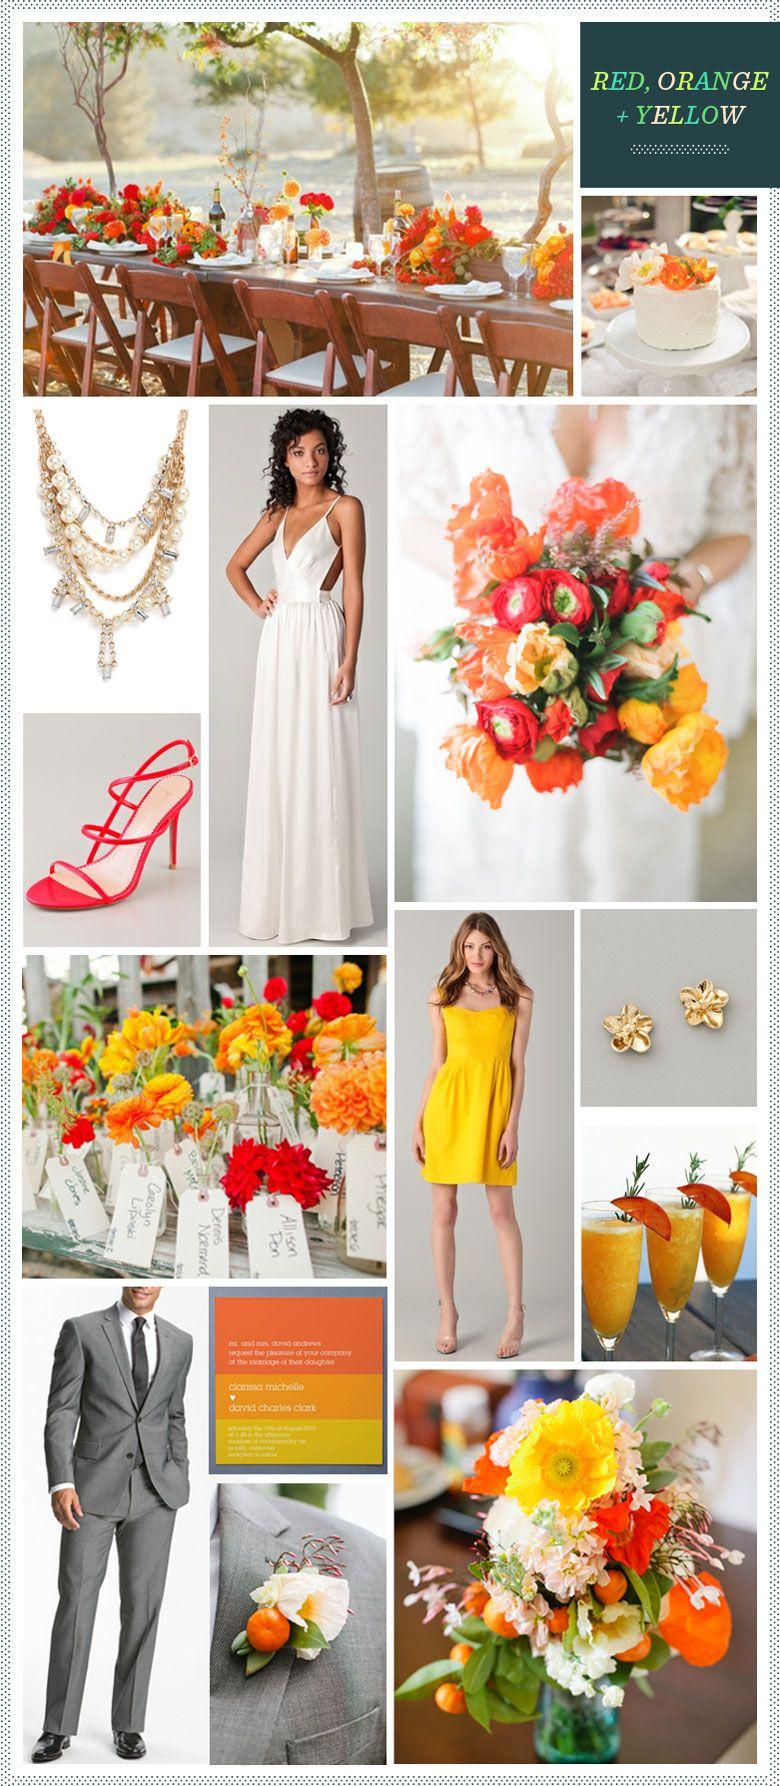 red, orange, yellow. | orange yellow weddings, summer